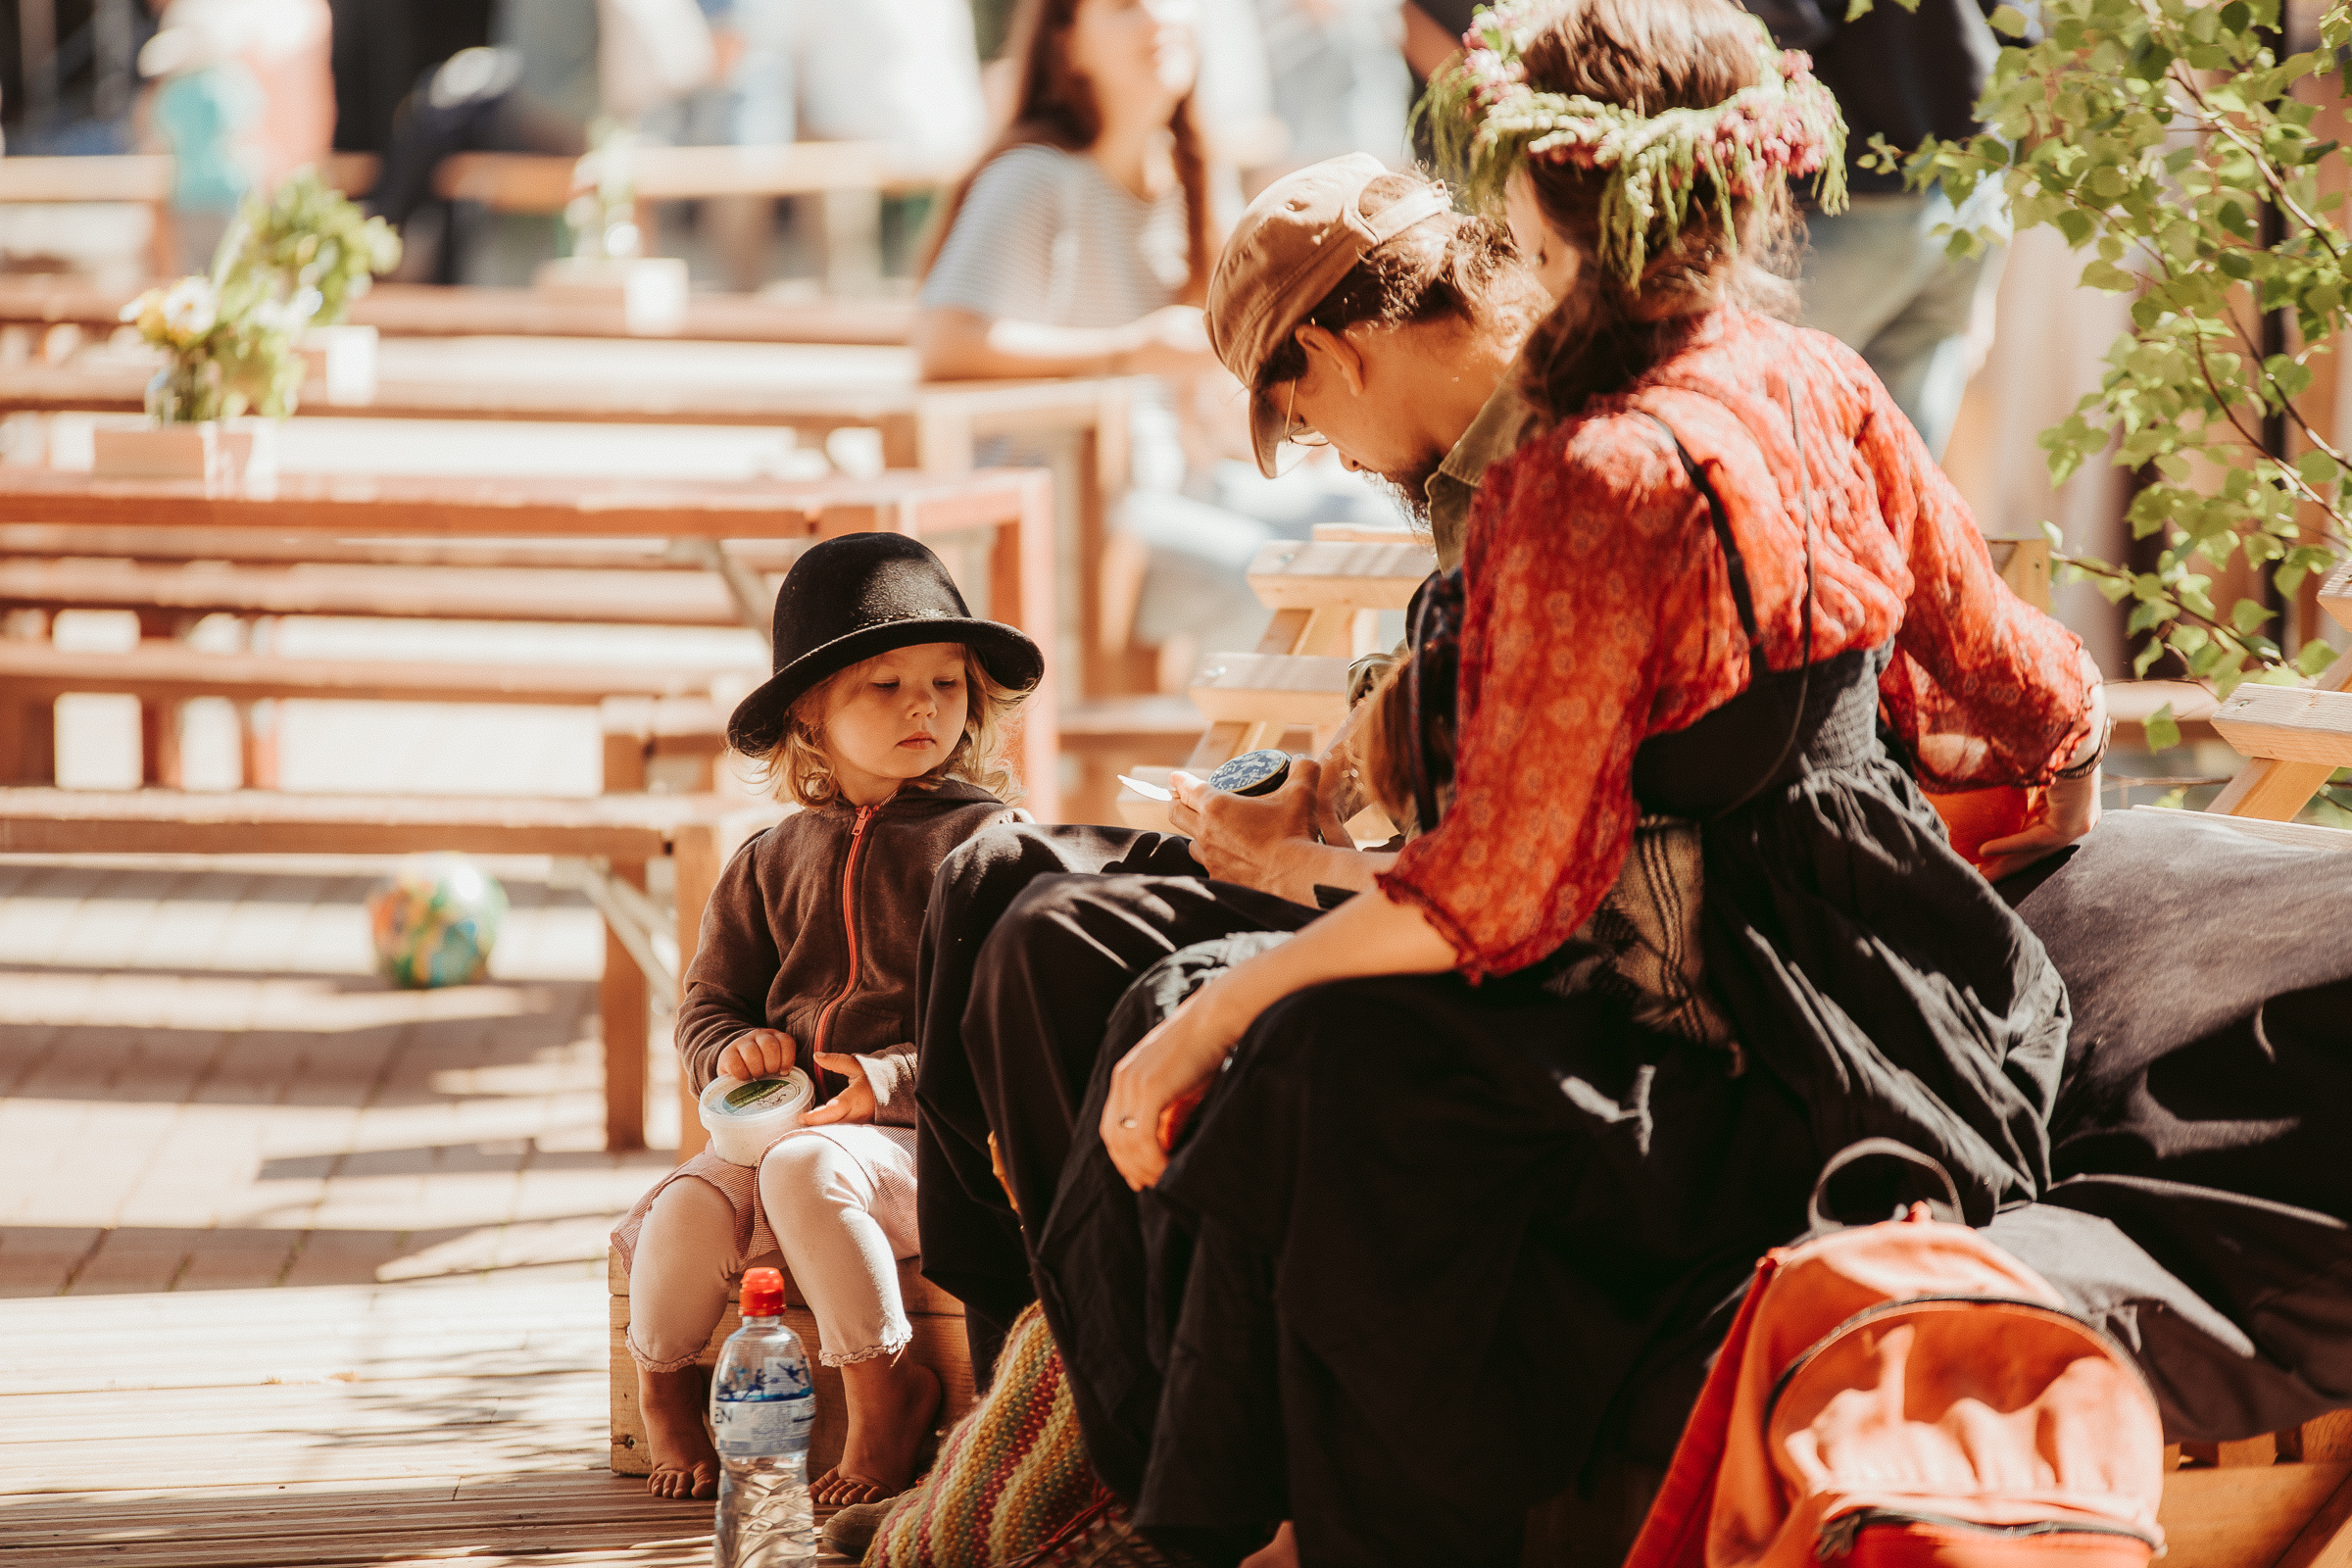 etnofestivals-sviests (2).jpg